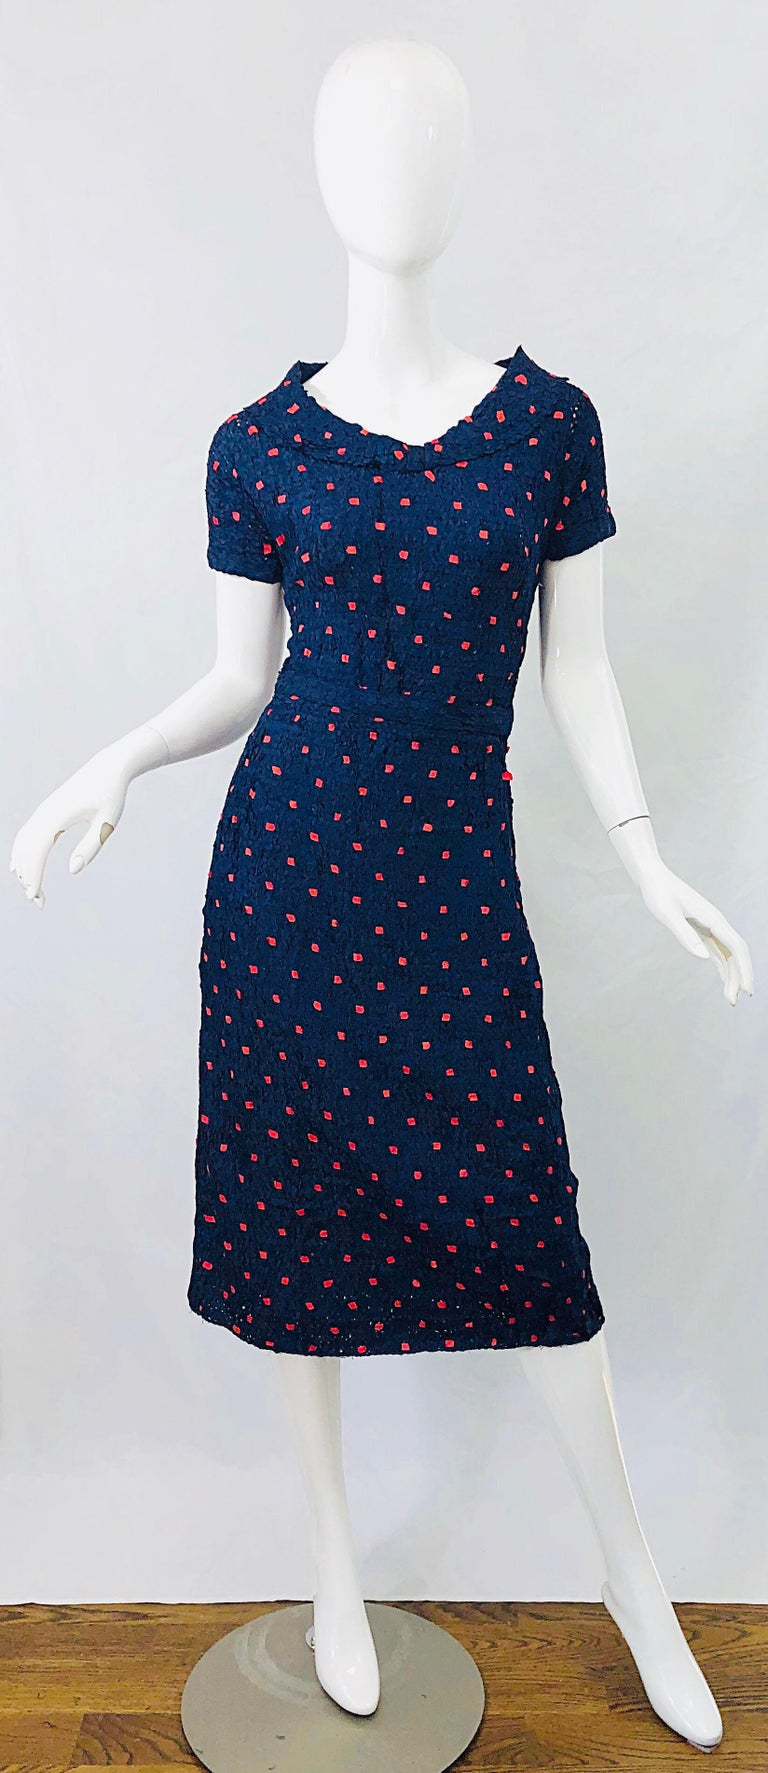 1950s Ann Fleischer for I Magnin Hand Ribbon Knit Navy Blue + Red Vintage Dress For Sale 8